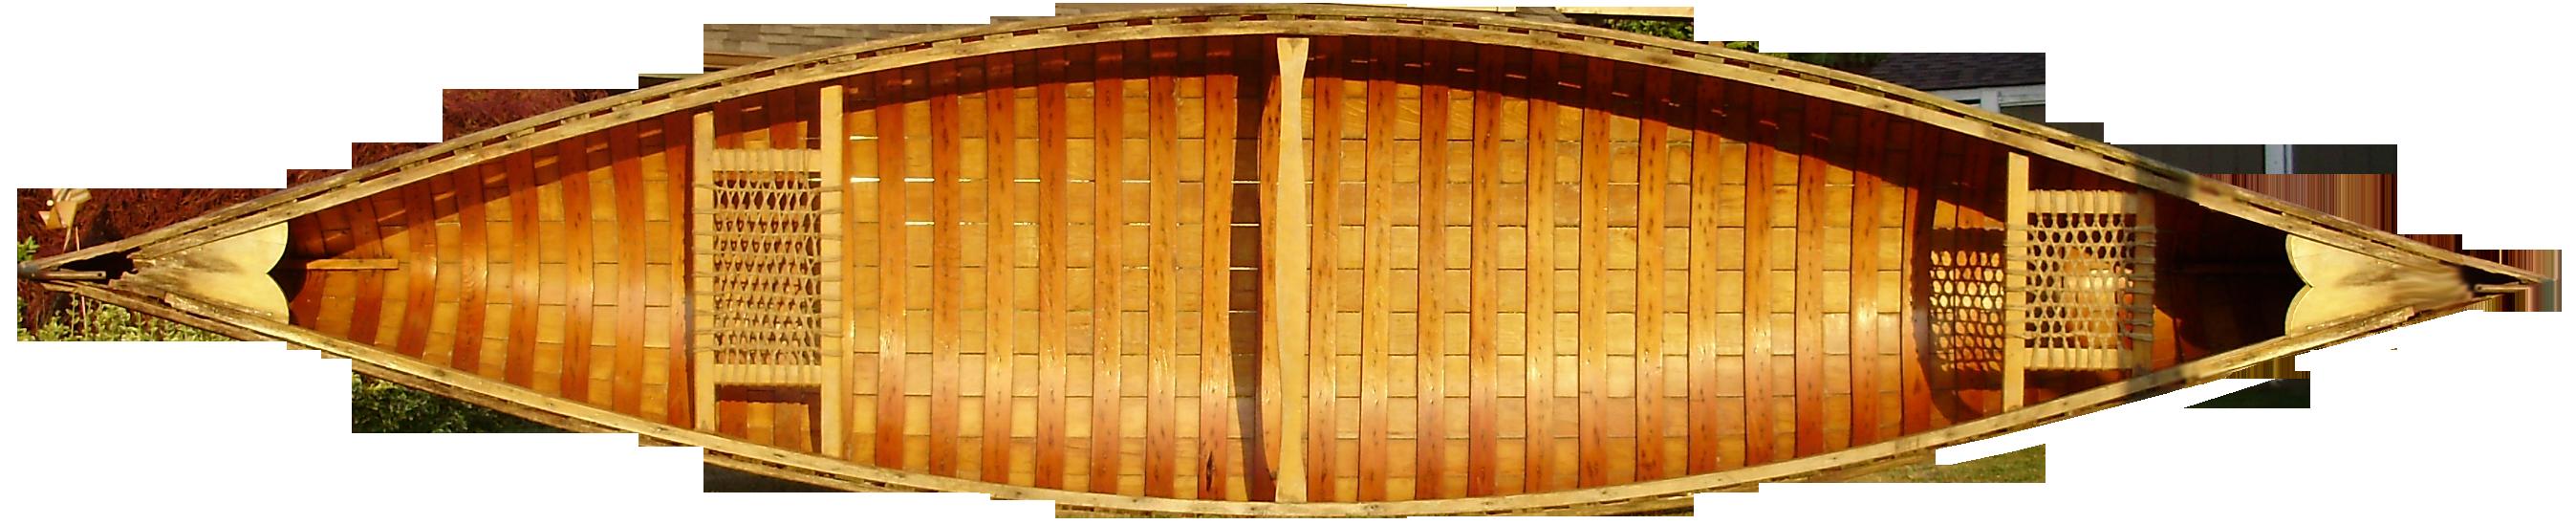 Clipart boat wood. Canoe large free images